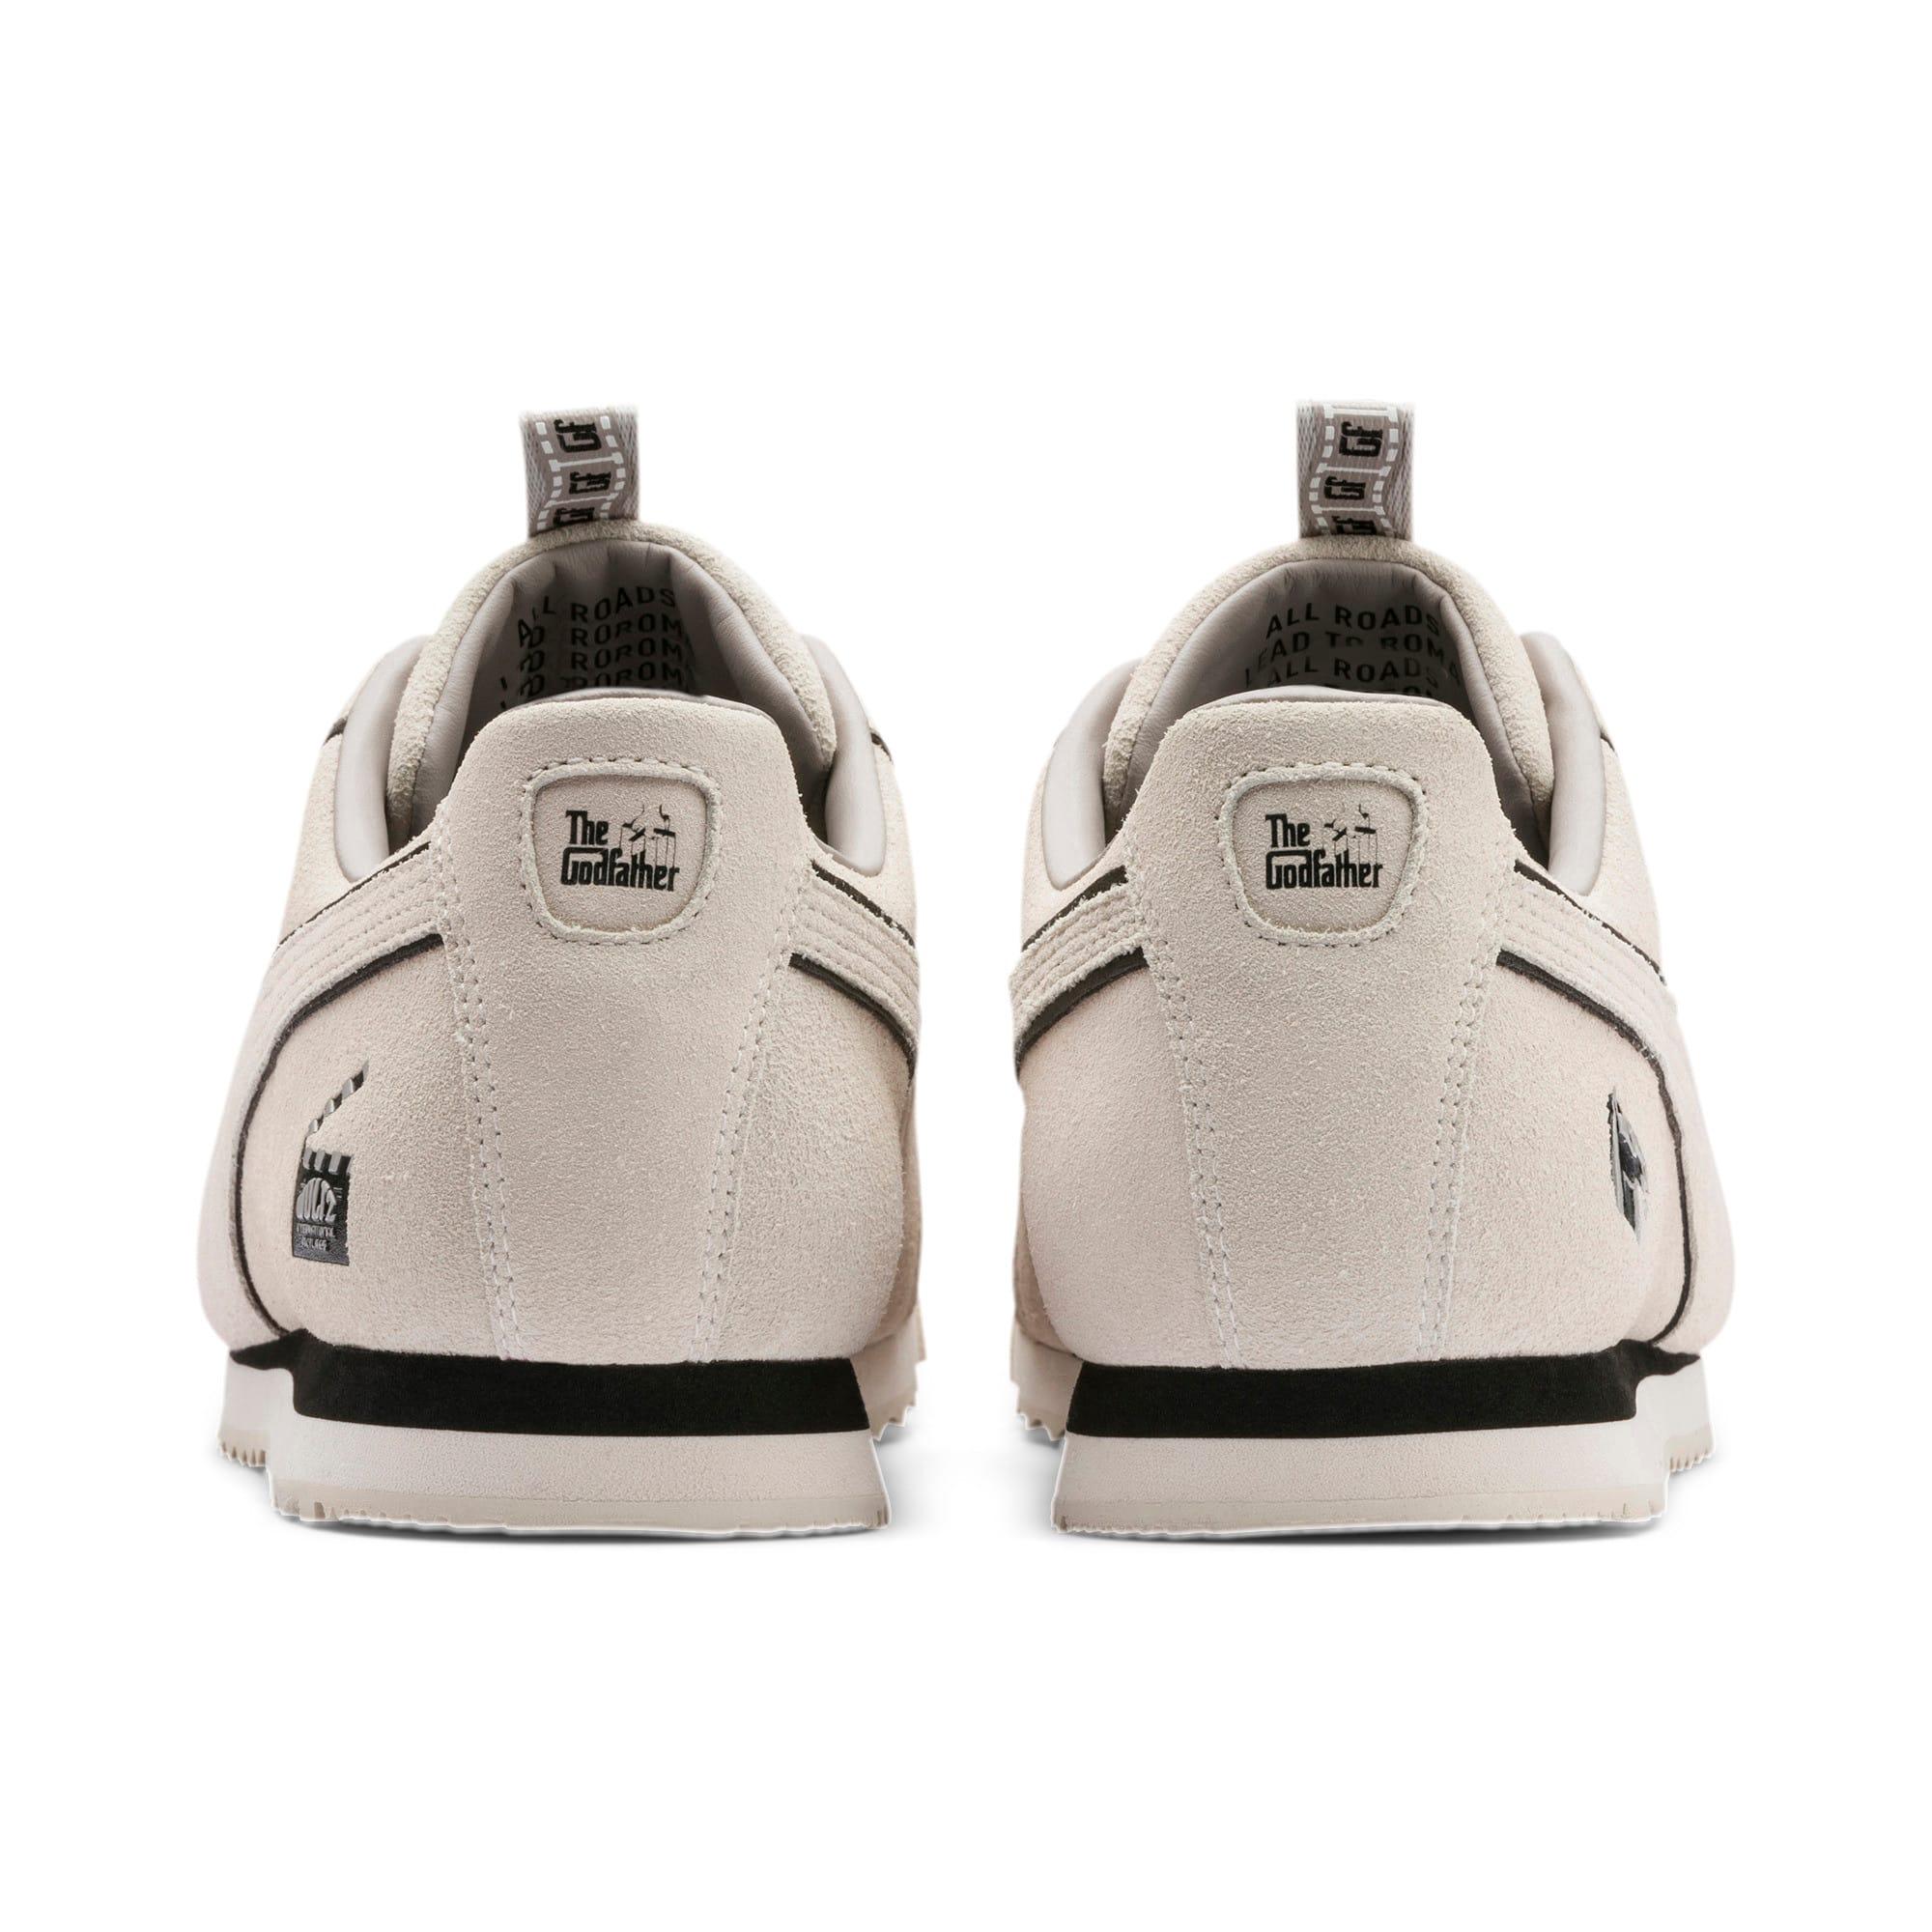 Thumbnail 3 of PUMA x THE GODFATHER Roma Woltz Sneakers, WINDCHIME-Puma Black, medium